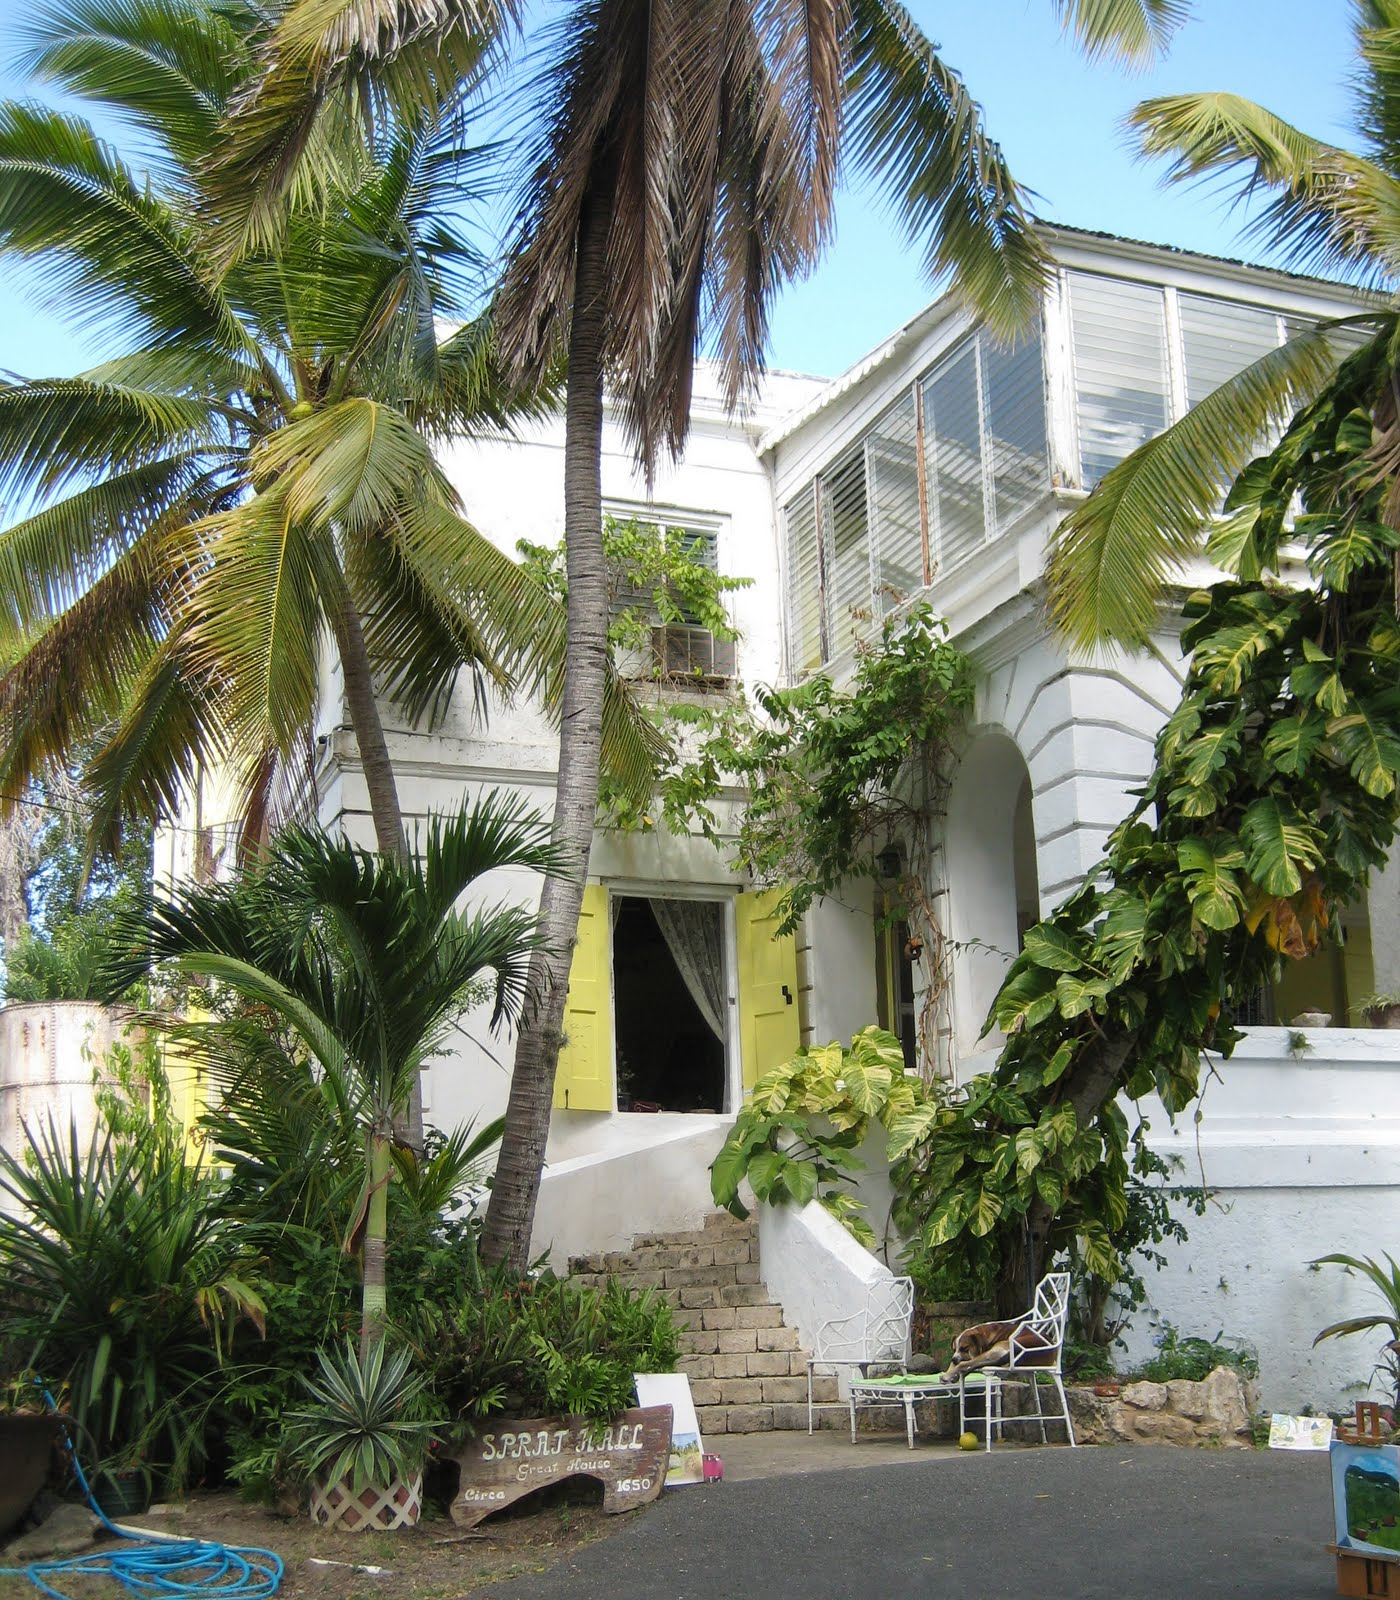 The Palletteers Of St. Croix: Sprat Hall Plantation